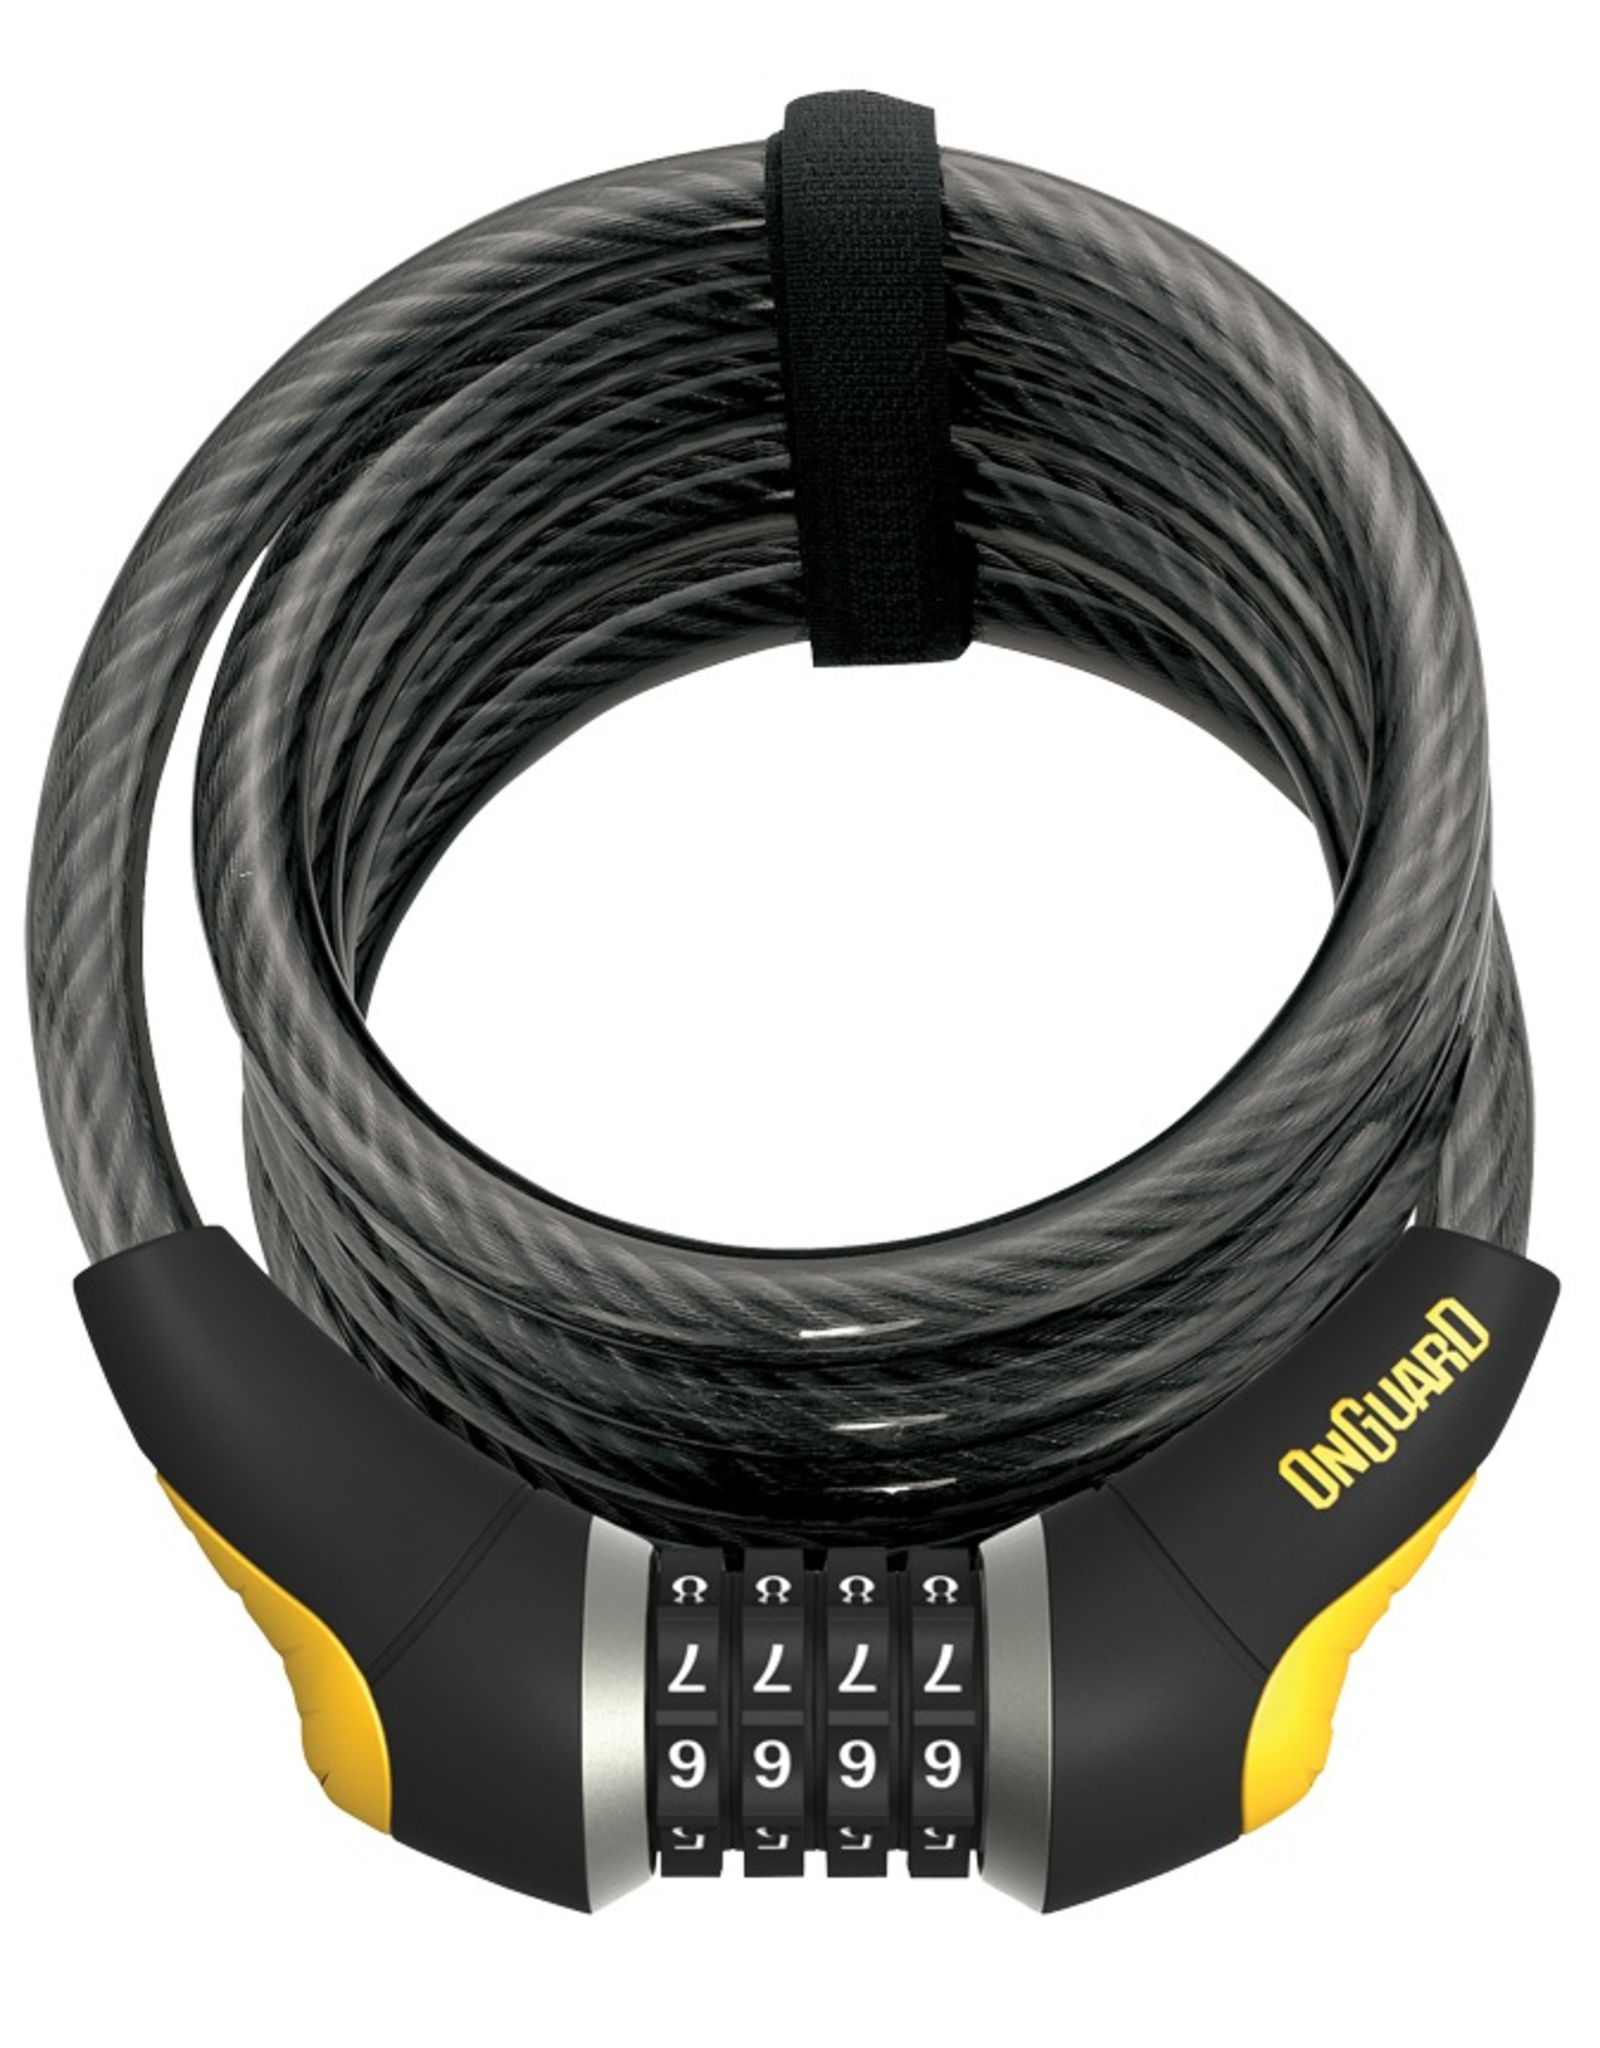 OnGuard OnGuard Doberman 8031, Black/Silver Resettable Combo Lock, 12mm